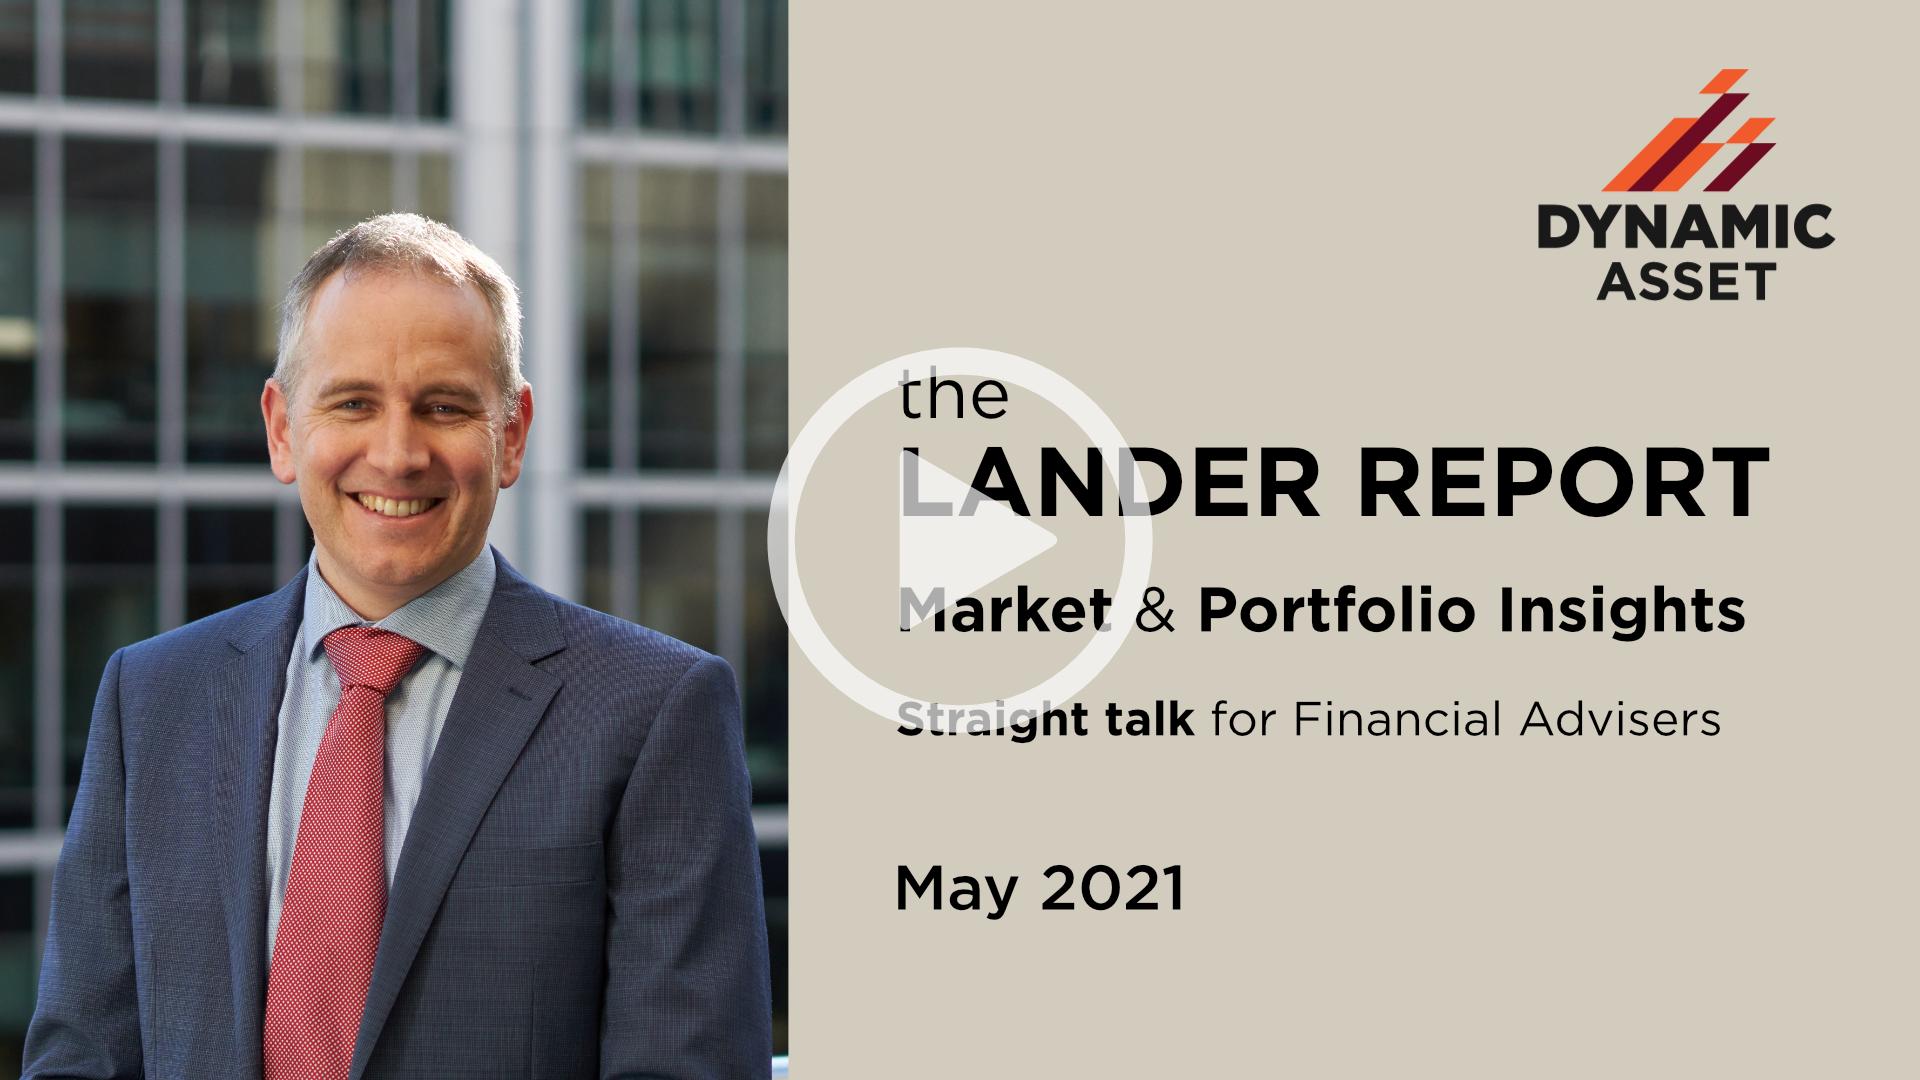 The Lander Report, Dynamic Asset